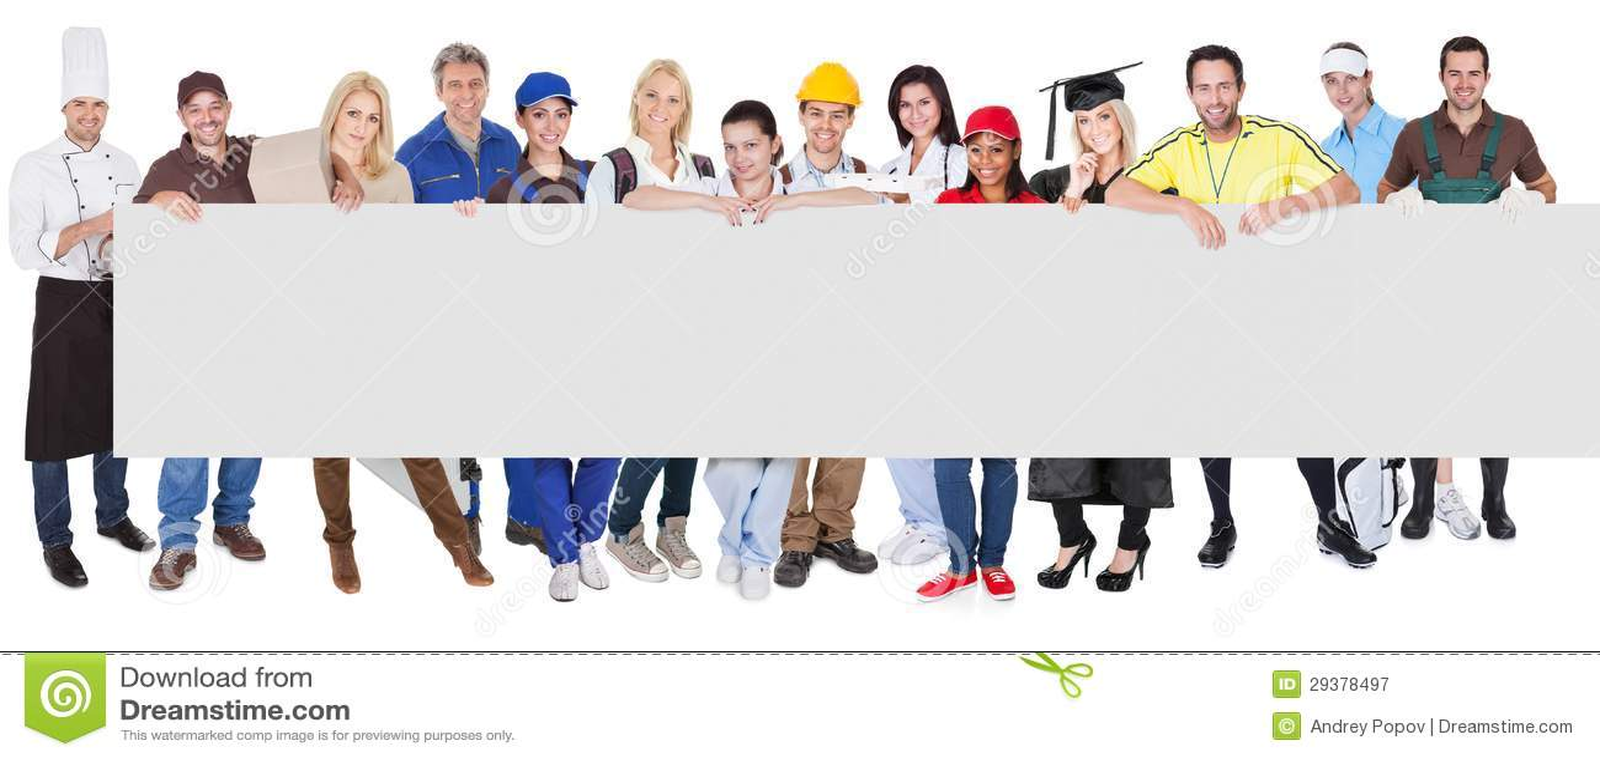 Grupo de profesionales diversos